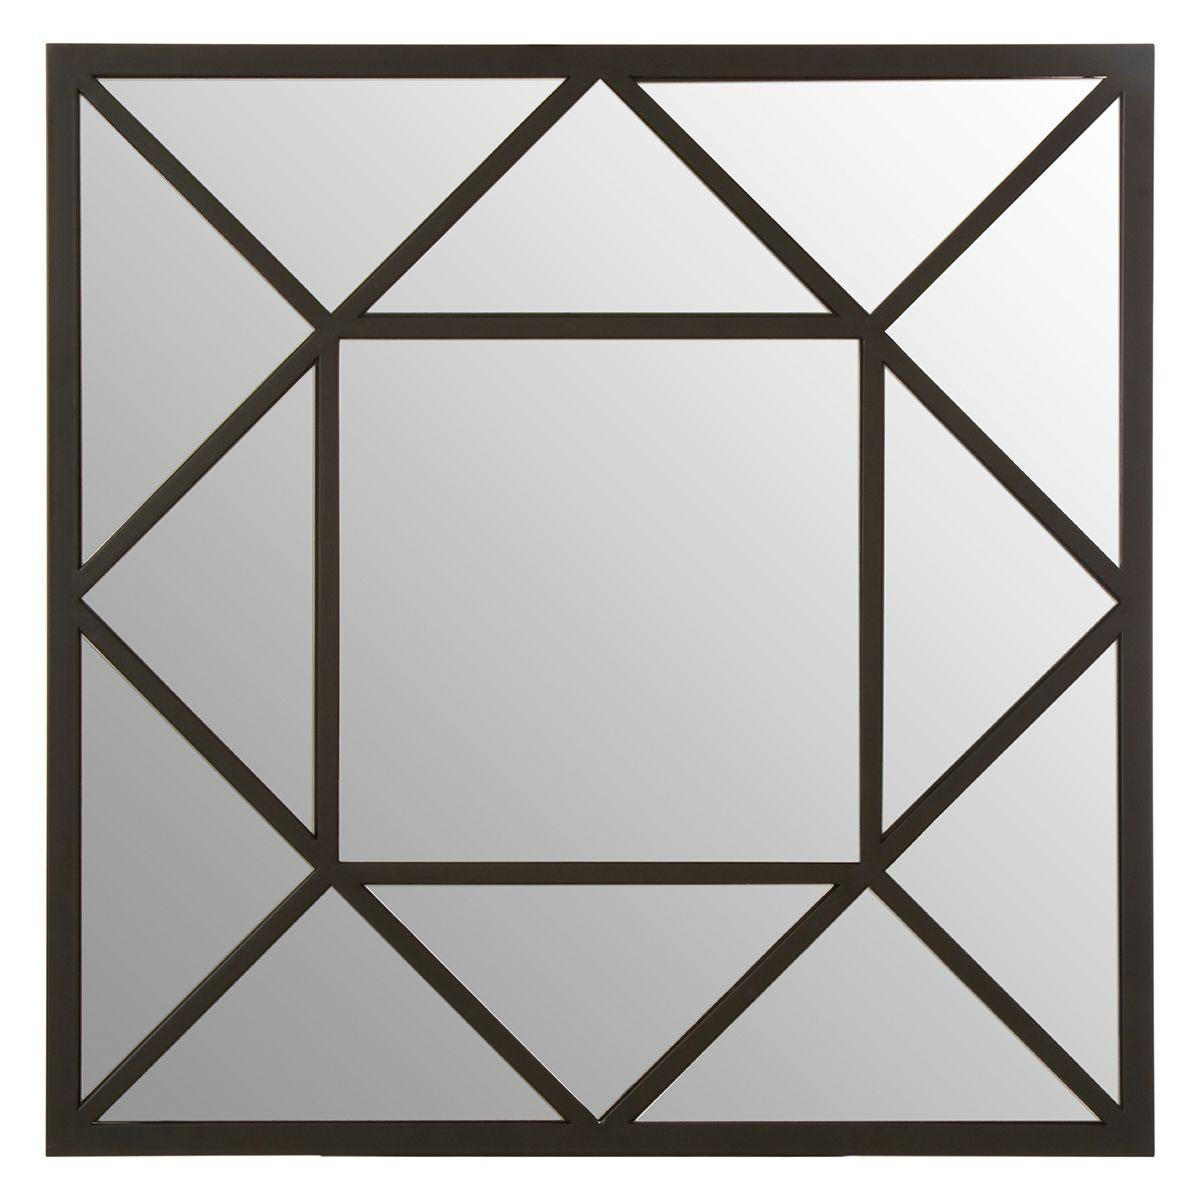 Premier Housewares Descartes Wall Mirror with Black Metal Frame